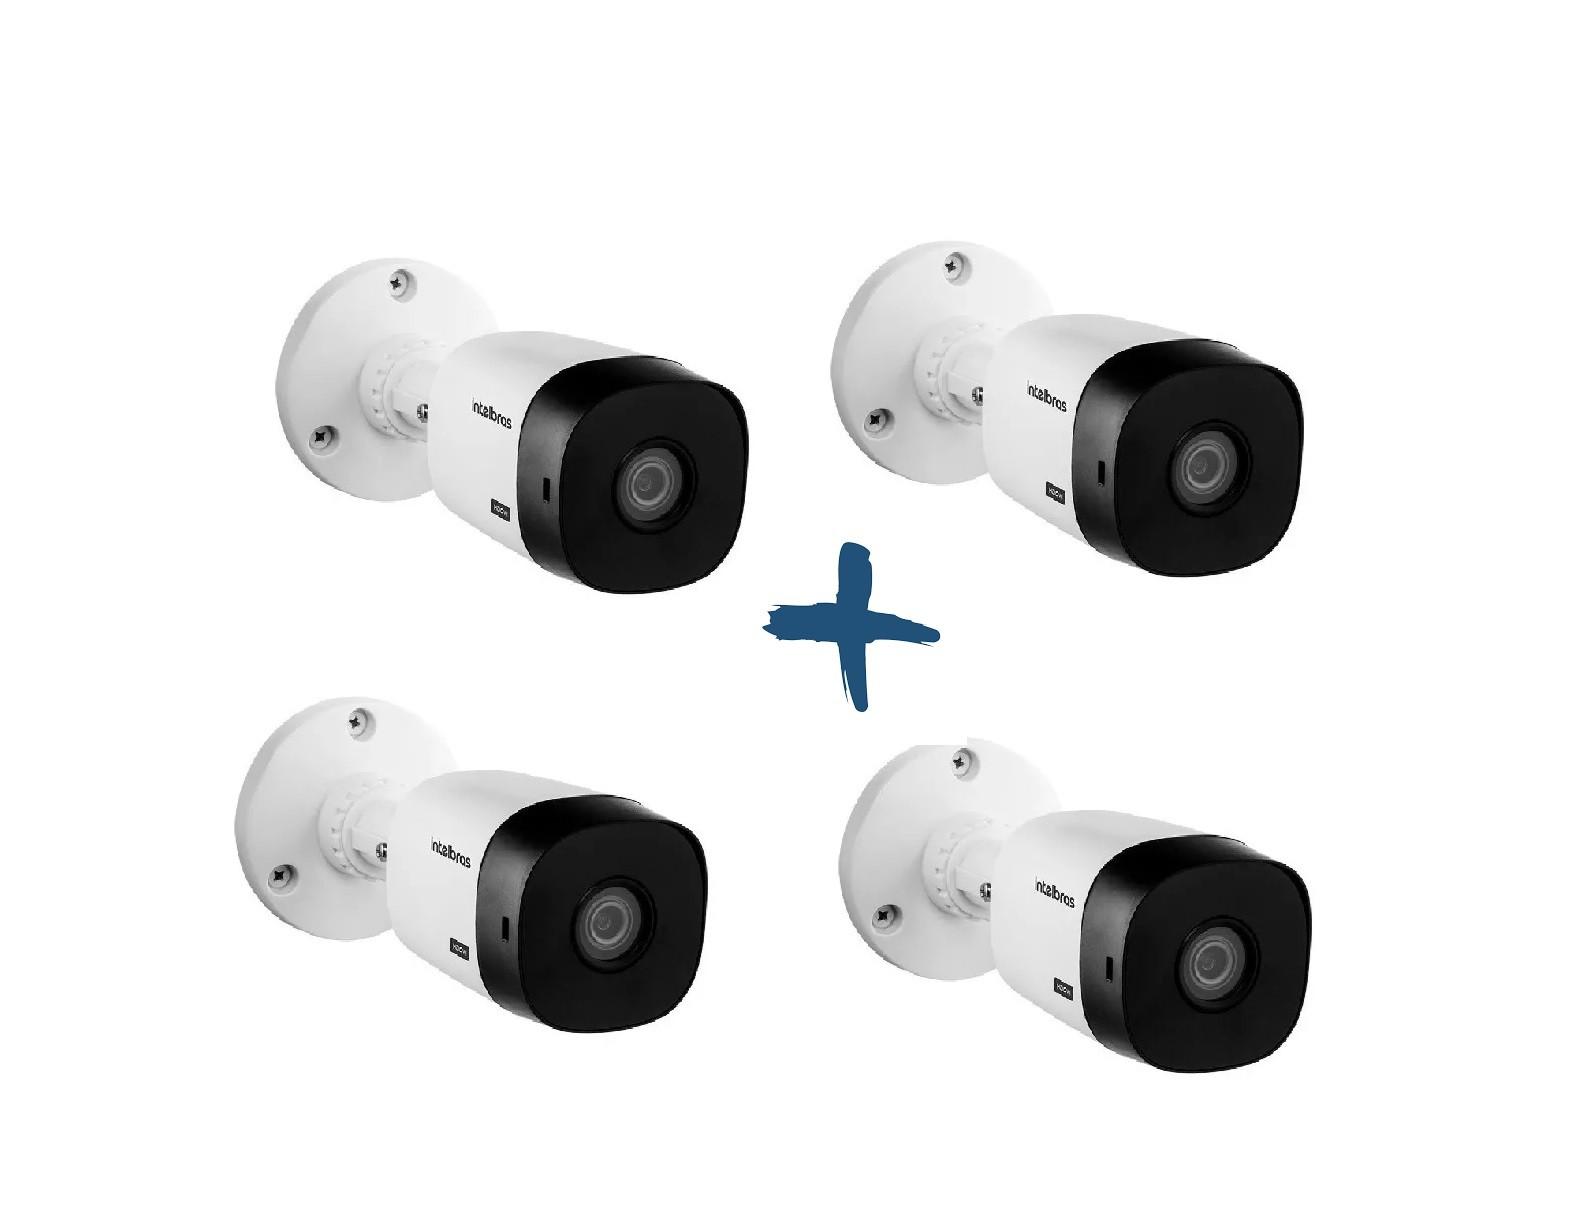 Kit Com 4 Câmeras Intelbras Vhd 1010b G6Hdcvi Hd 720p Bullet